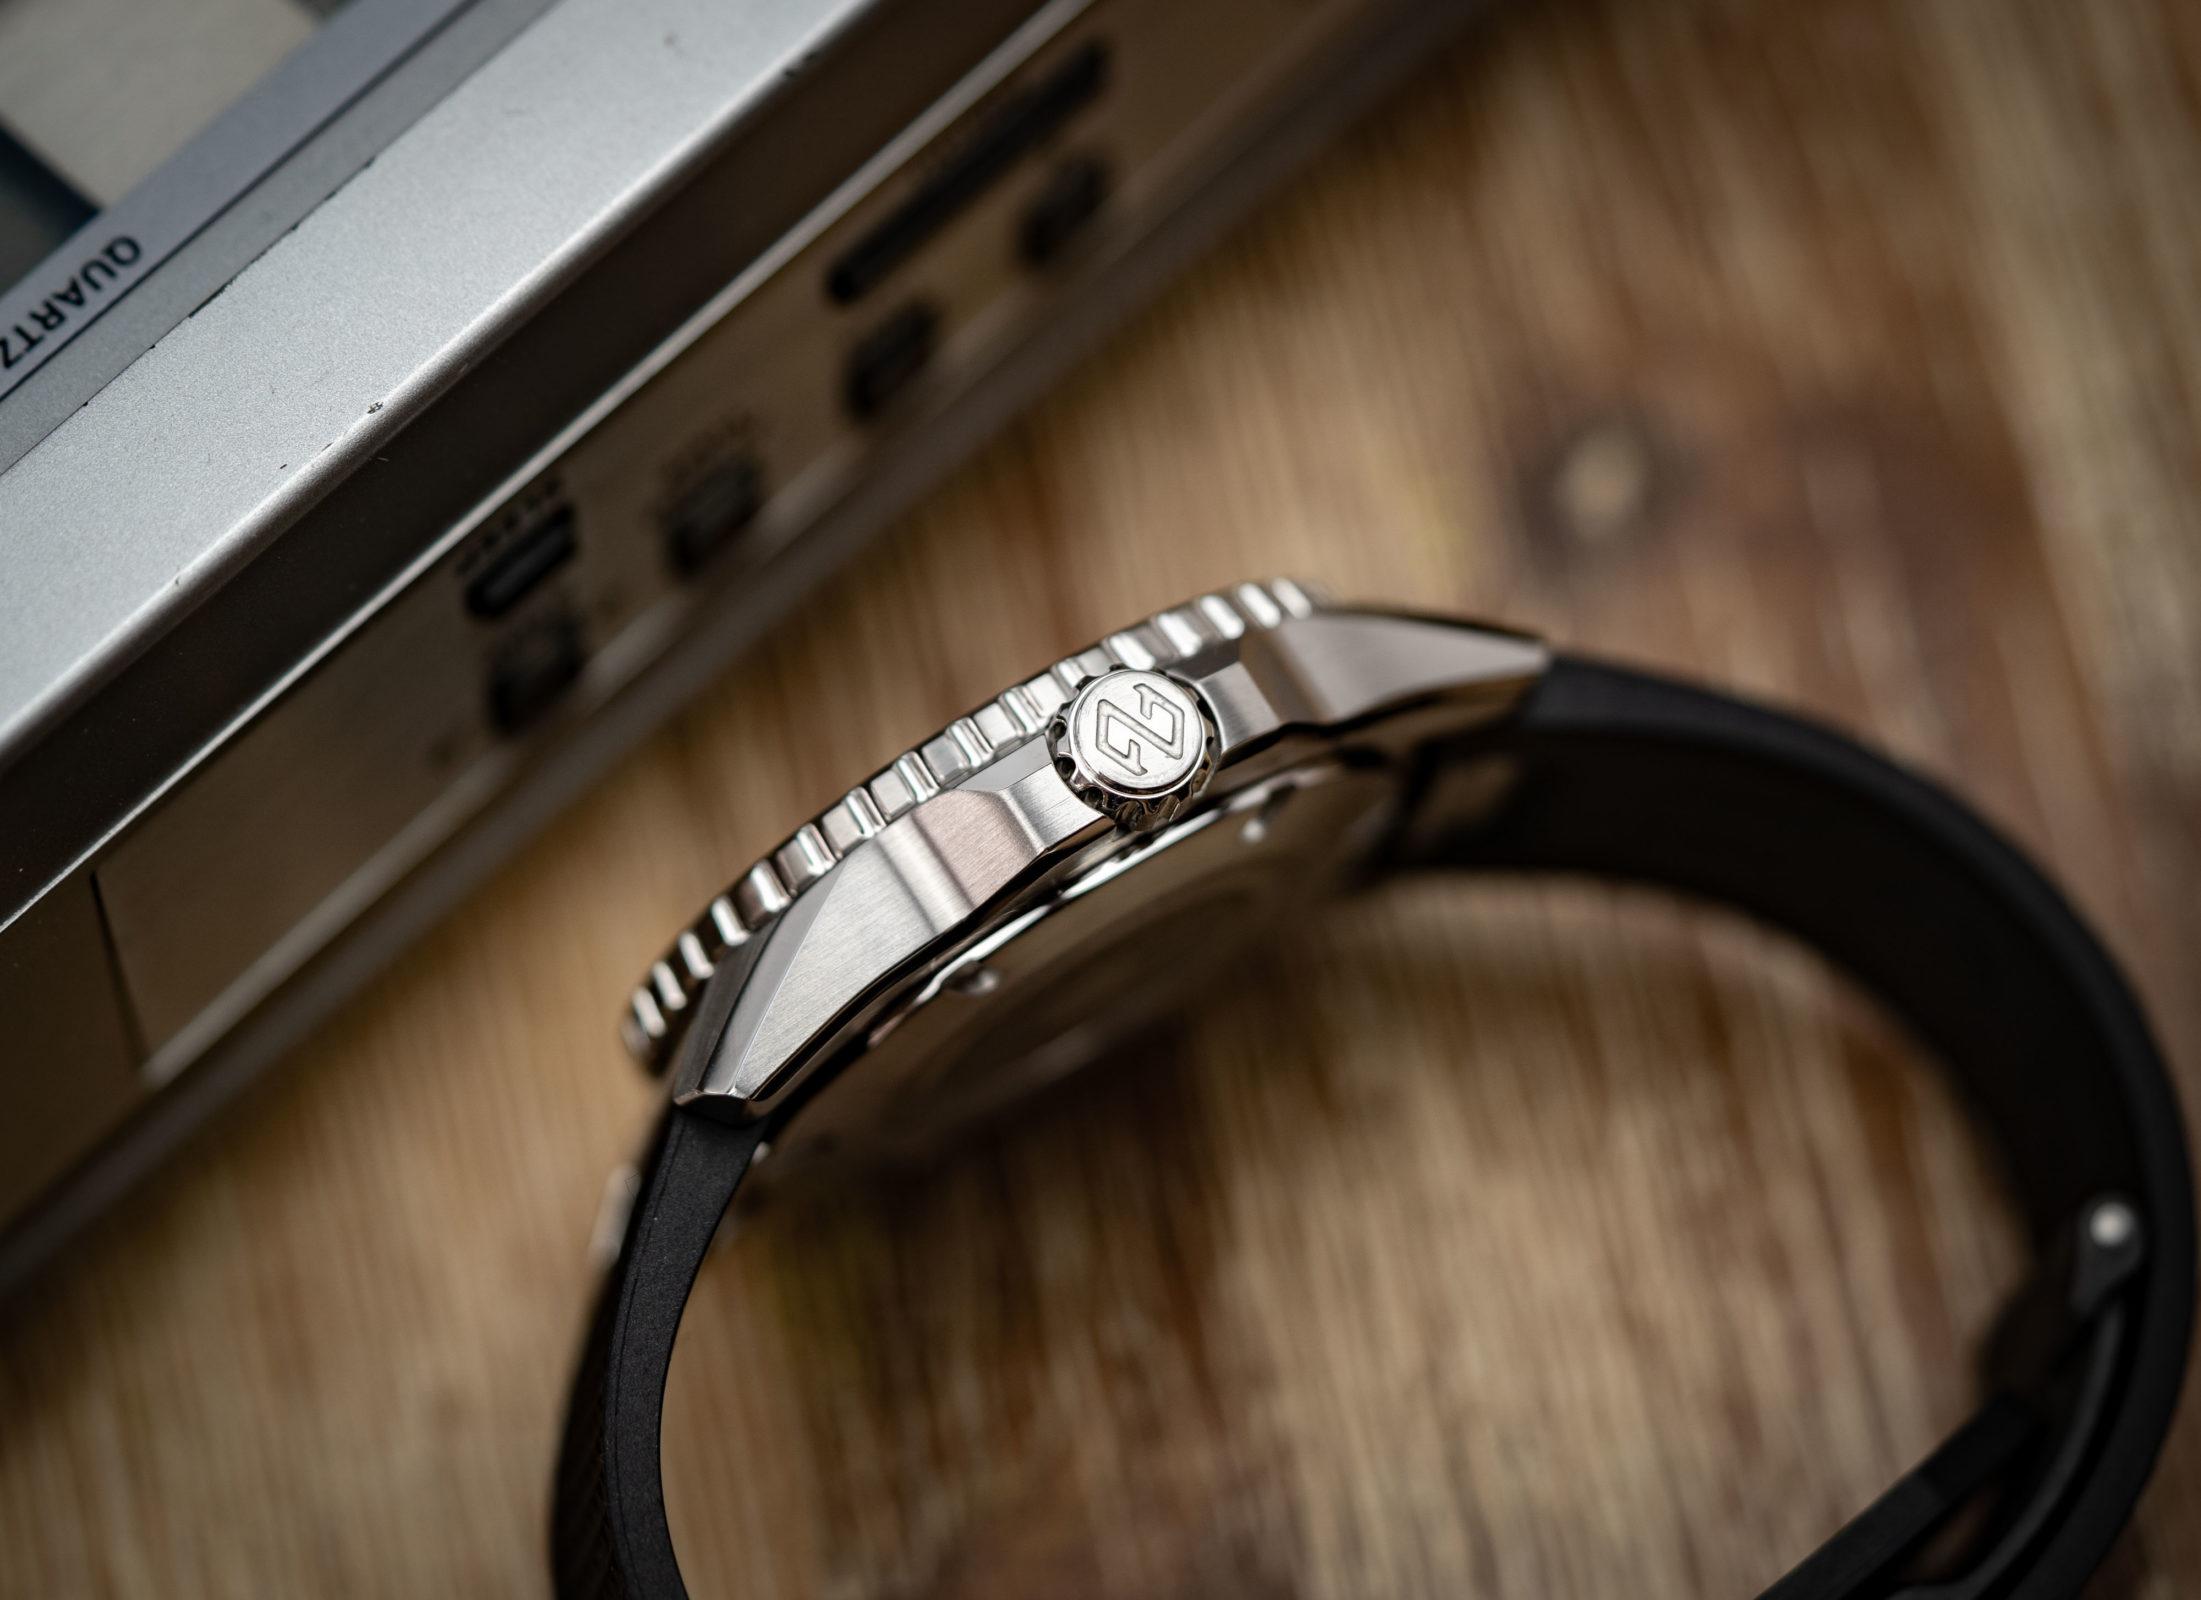 Formex-Reef-Automatik-Chronometer-300m-13